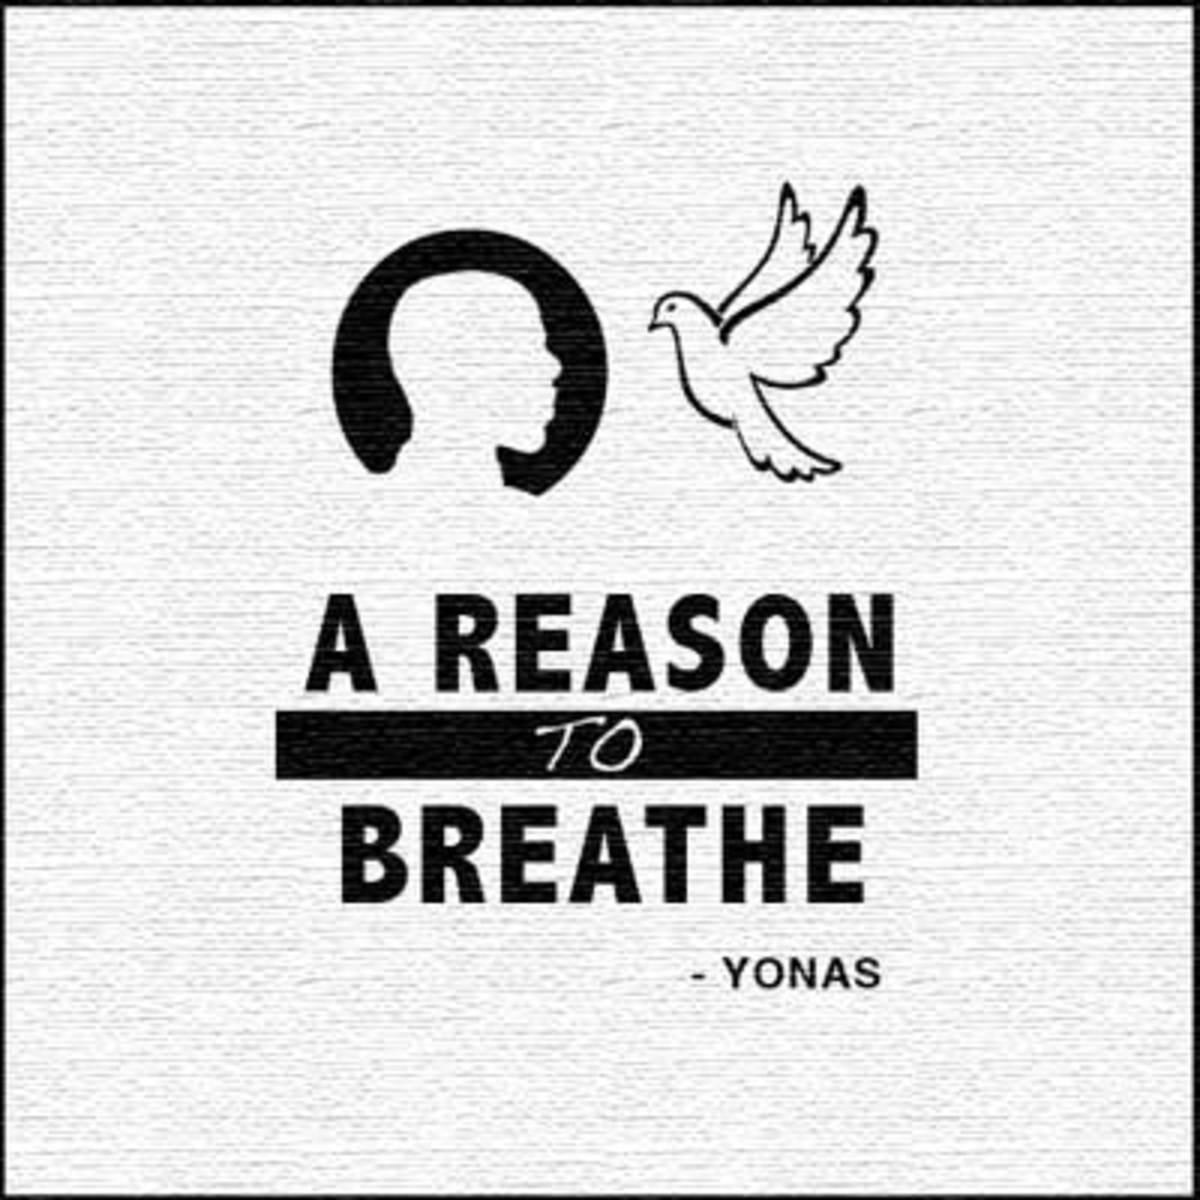 yonas-areasontobreathe.jpg